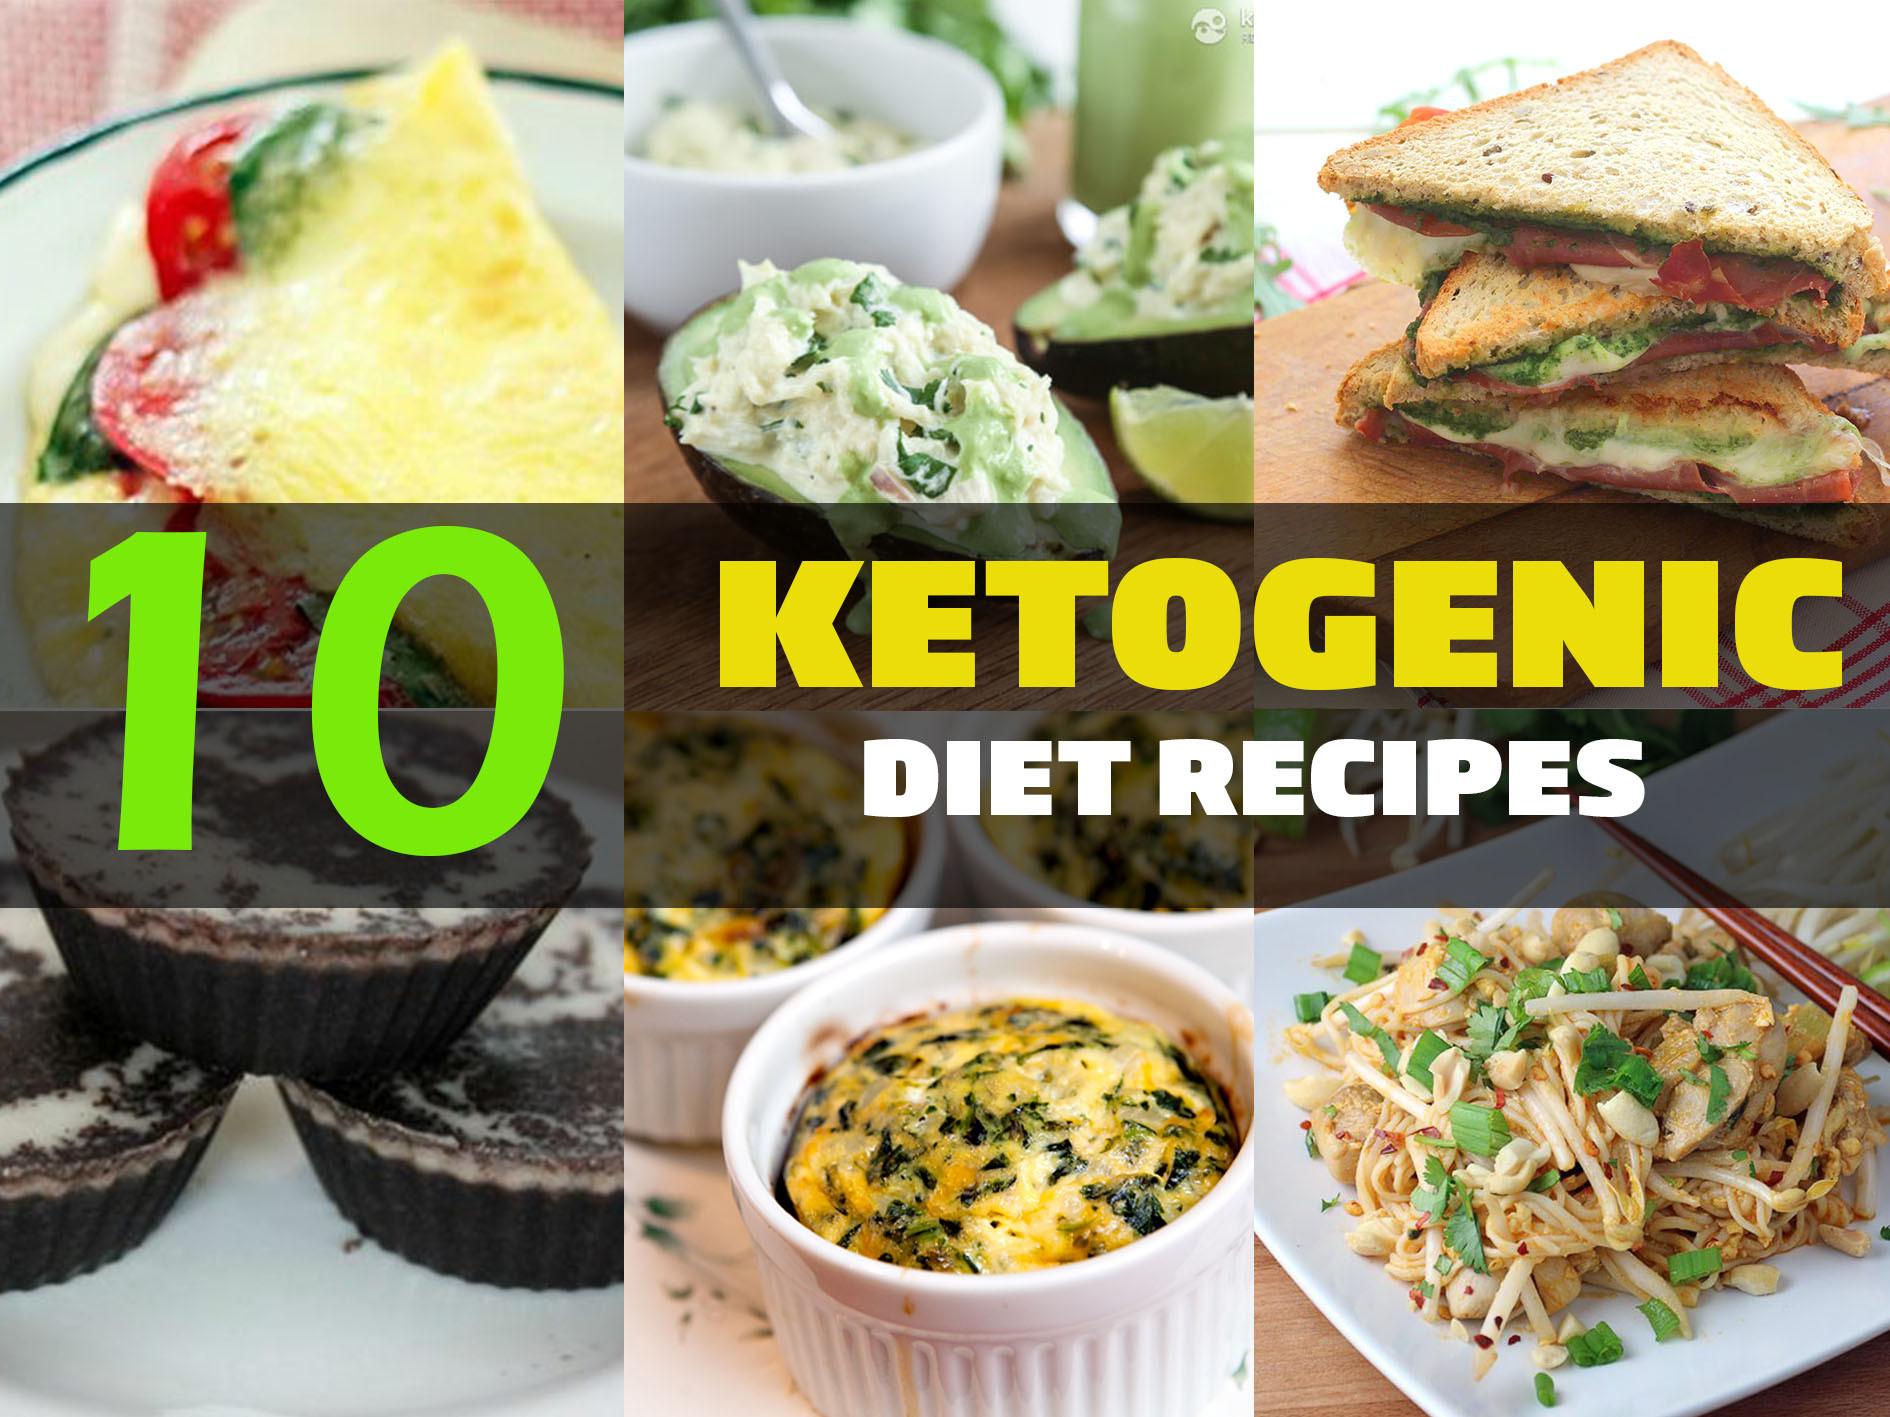 Healthy Keto Recipes  10 Keto Recipes — High in Healthy Fats Low in Carbs